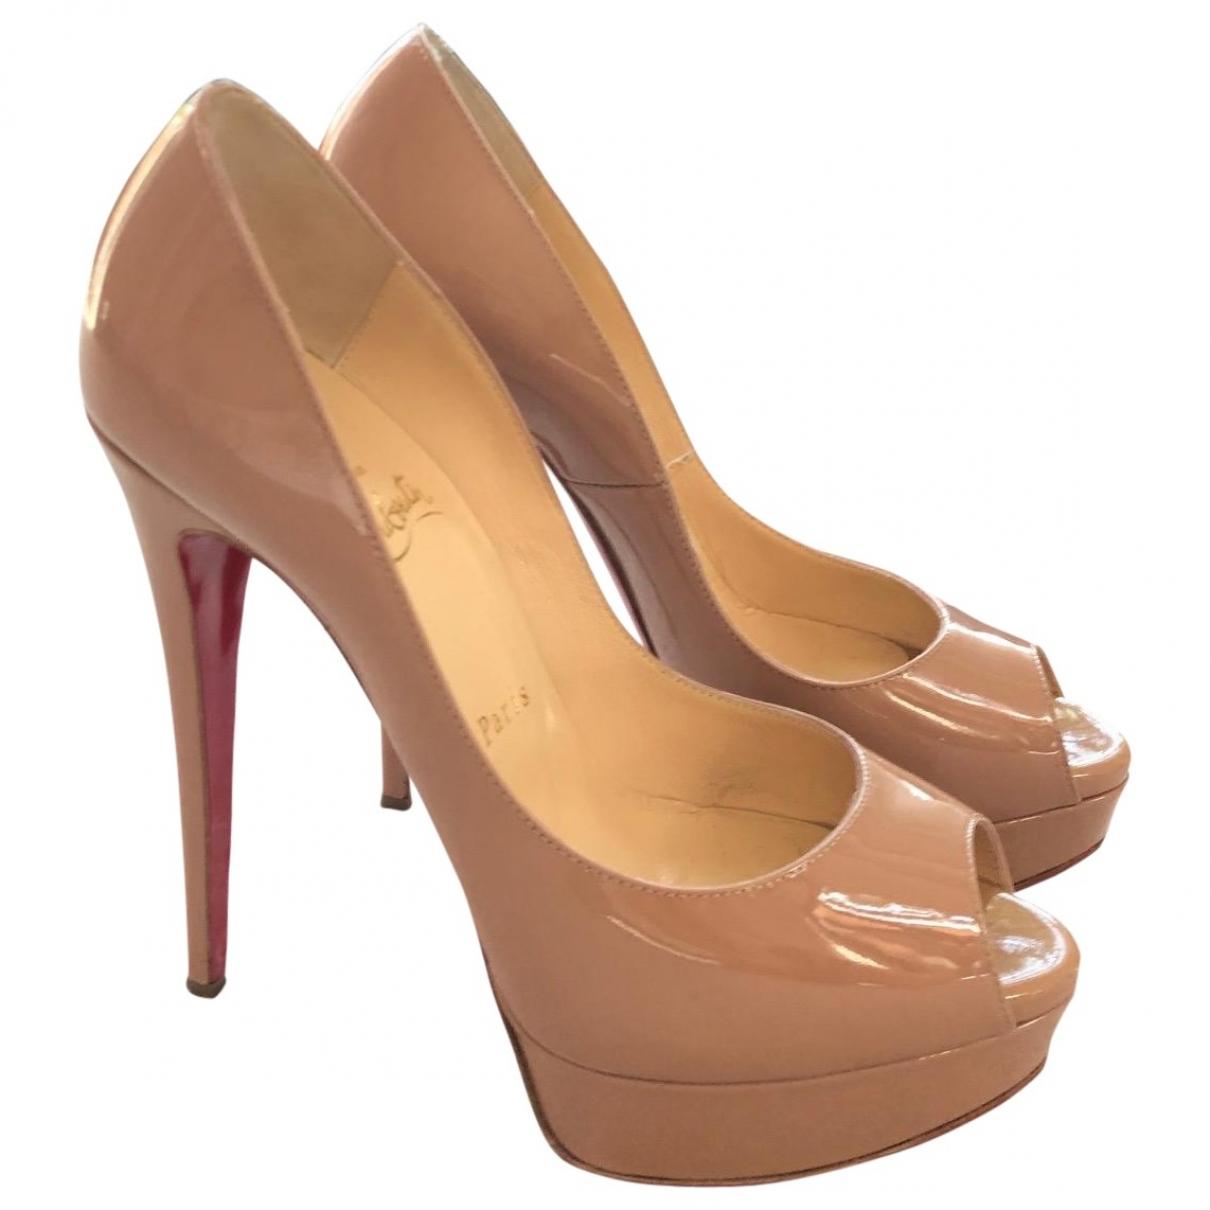 Christian Louboutin Lady Peep Beige Patent leather Heels for Women 38.5 EU